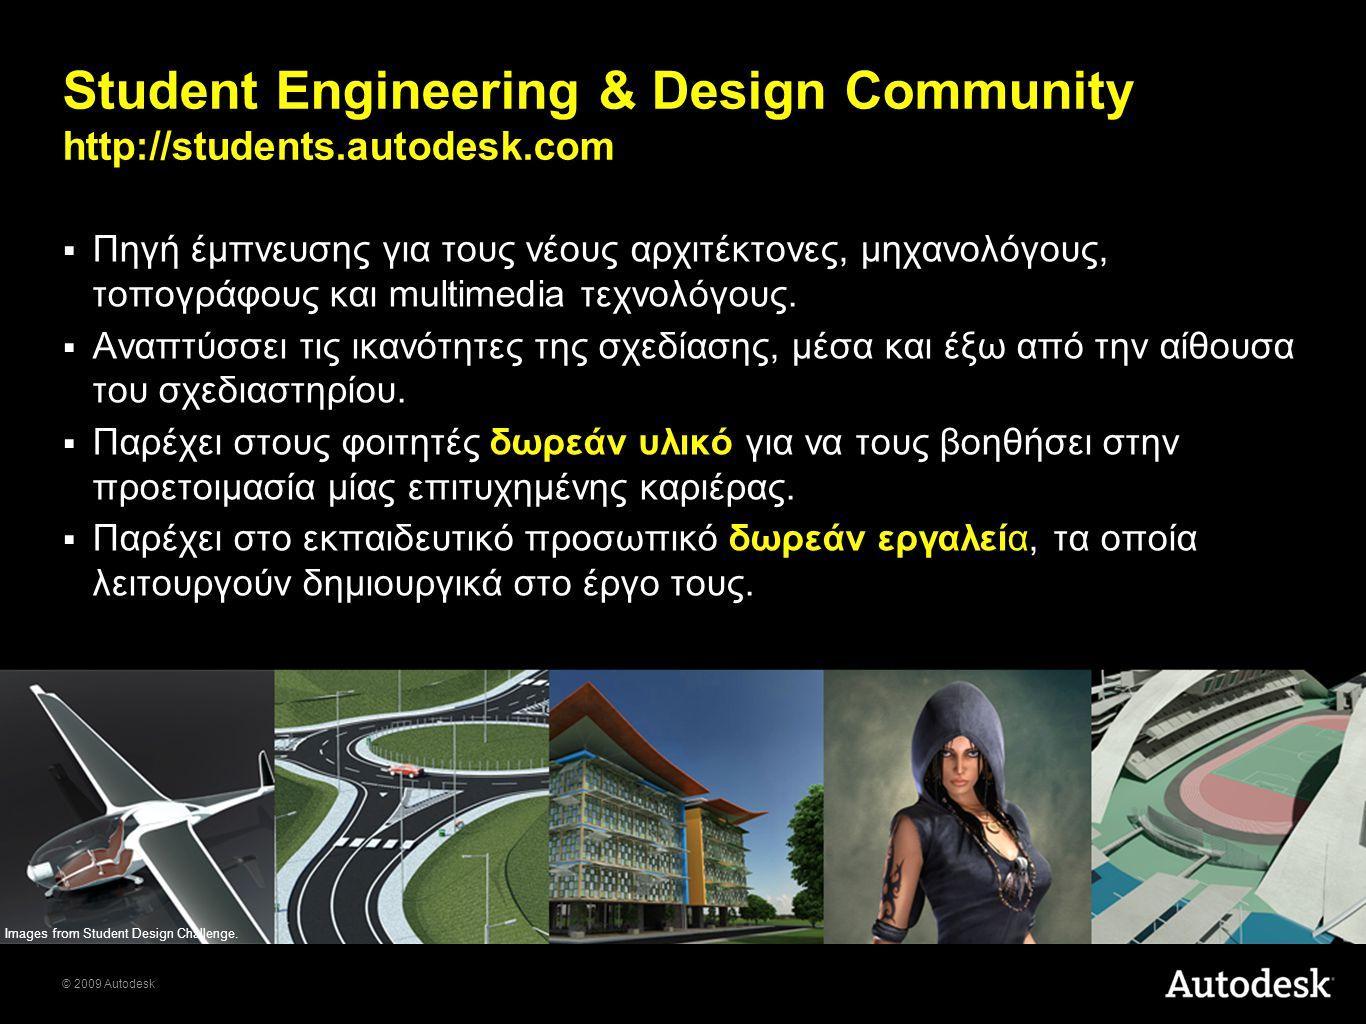 © 2009 Autodesk Student Engineering & Design Community http://students.autodesk.com  Πηγή έμπνευσης για τους νέους αρχιτέκτονες, μηχανολόγους, τοπογρ